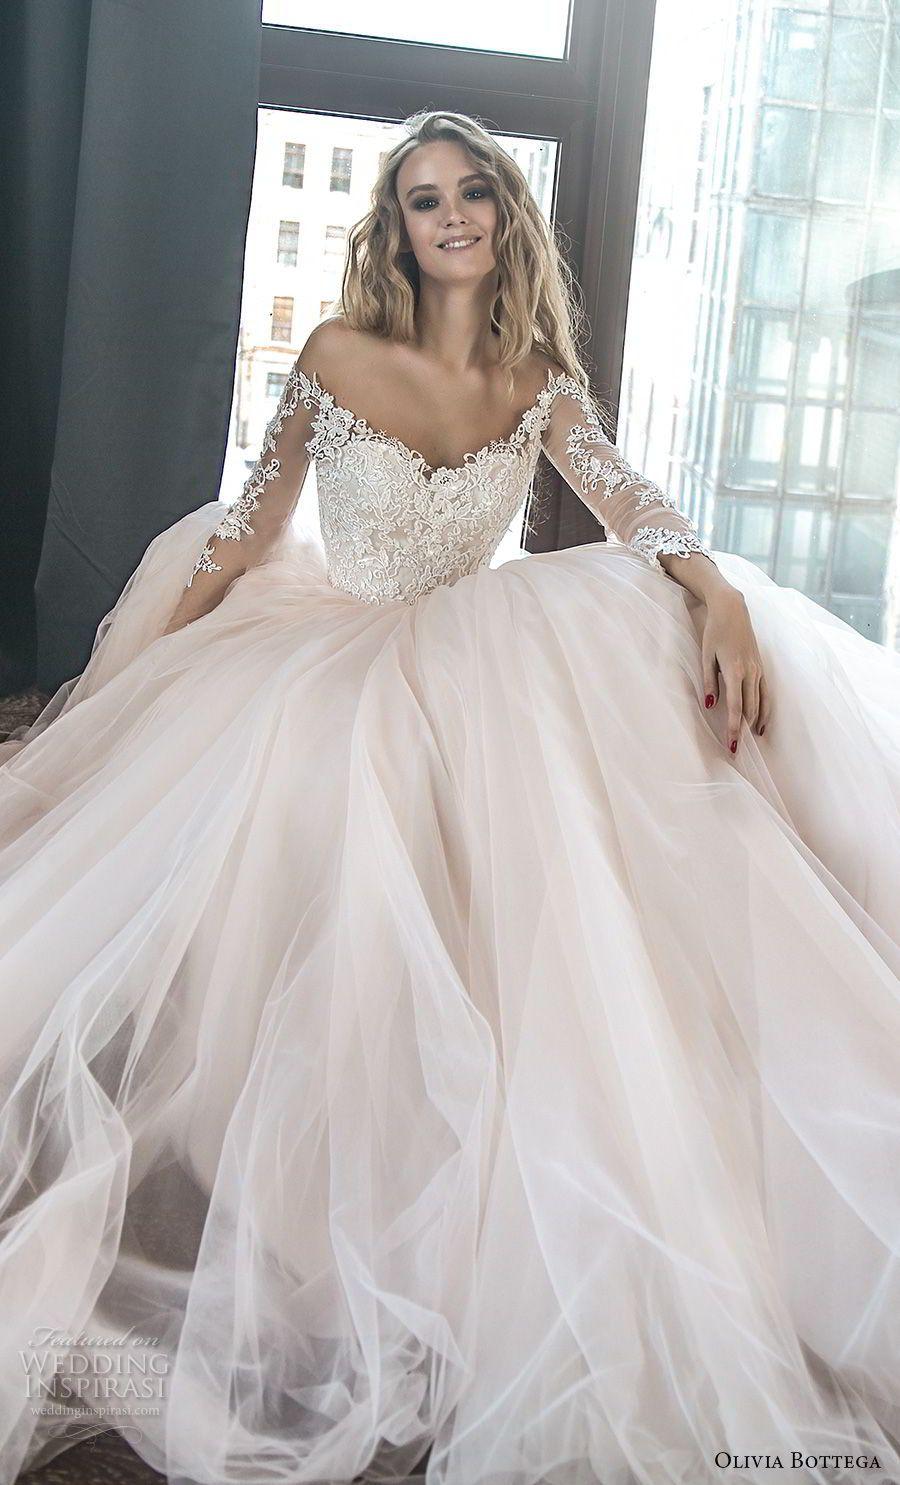 Olivia bottega wedding dresses ball gowns bodice and neckline